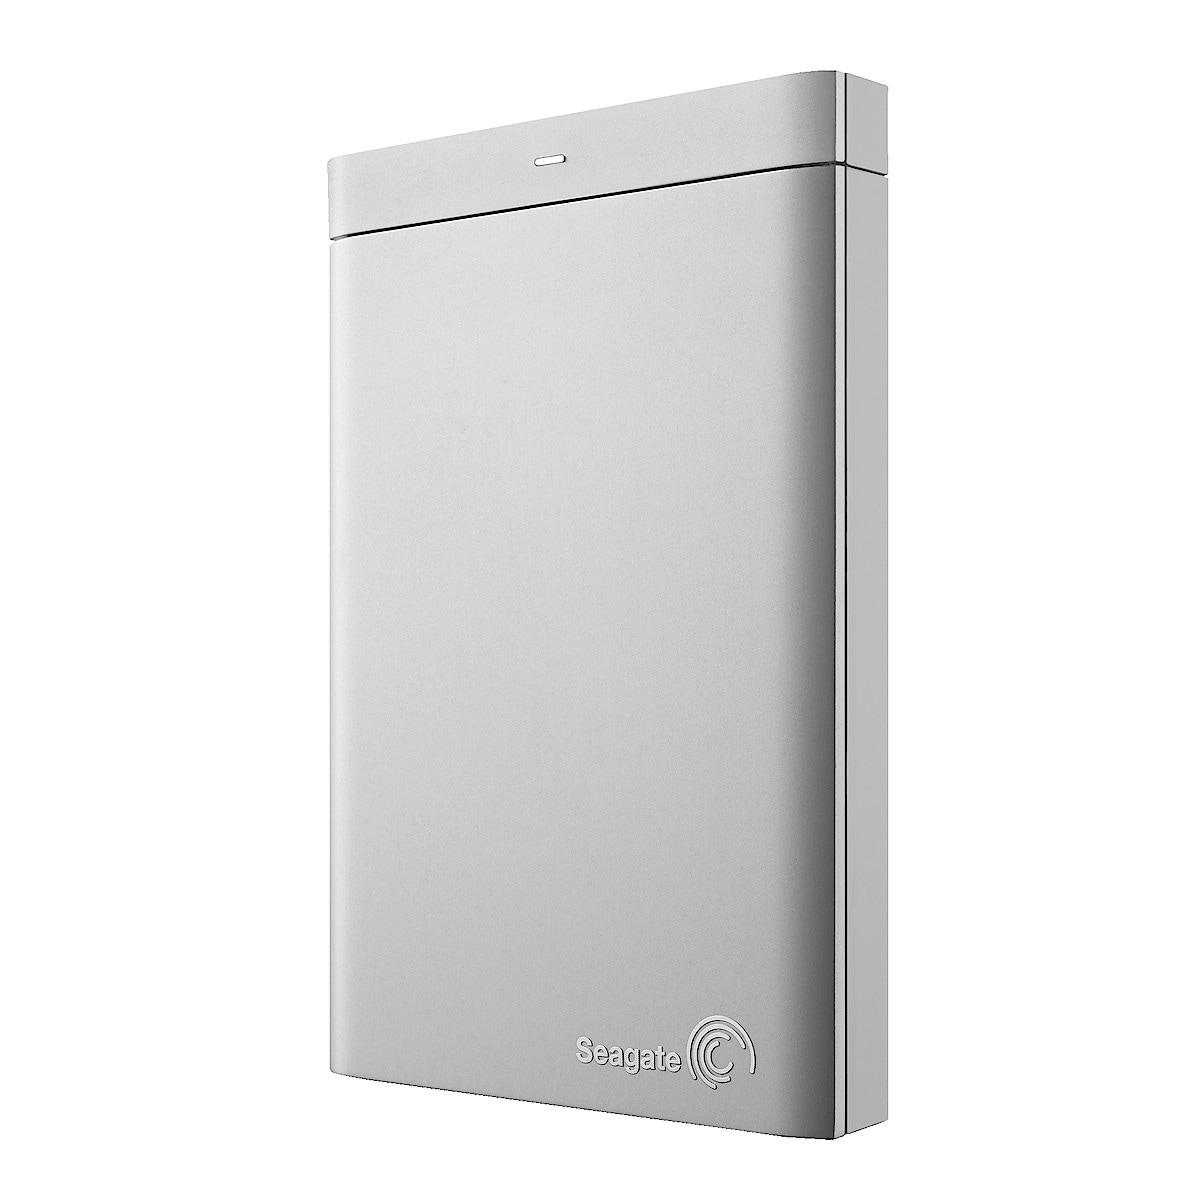 Extern hårddisk 1 TB, Seagate Backup Plus for Mac